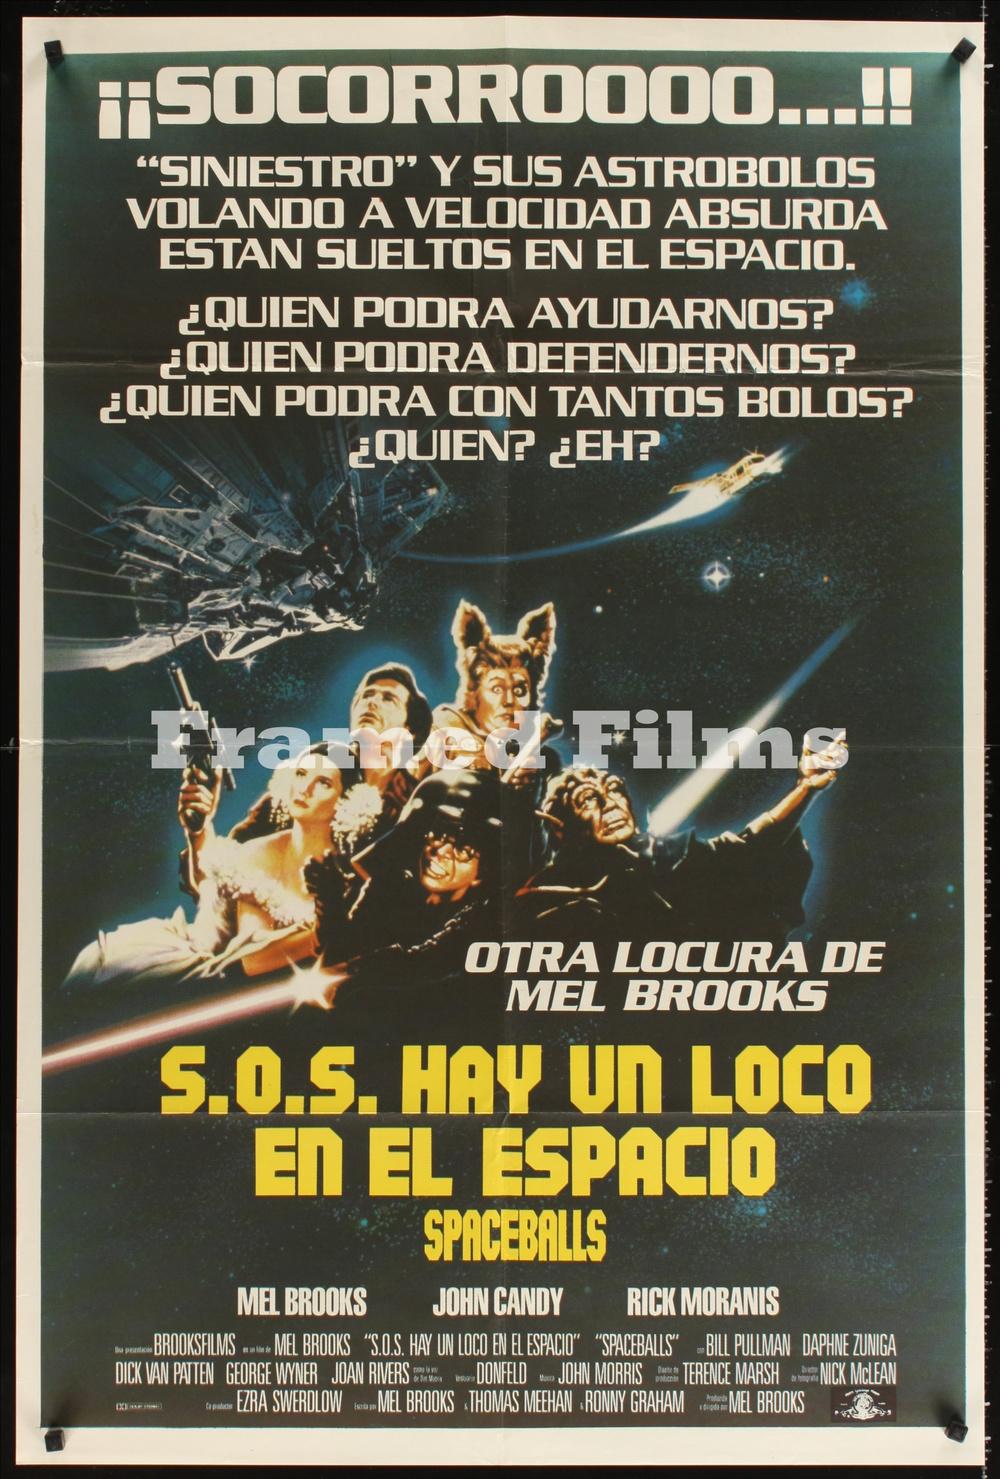 argentinean_spaceballs_JC04130_L.jpg